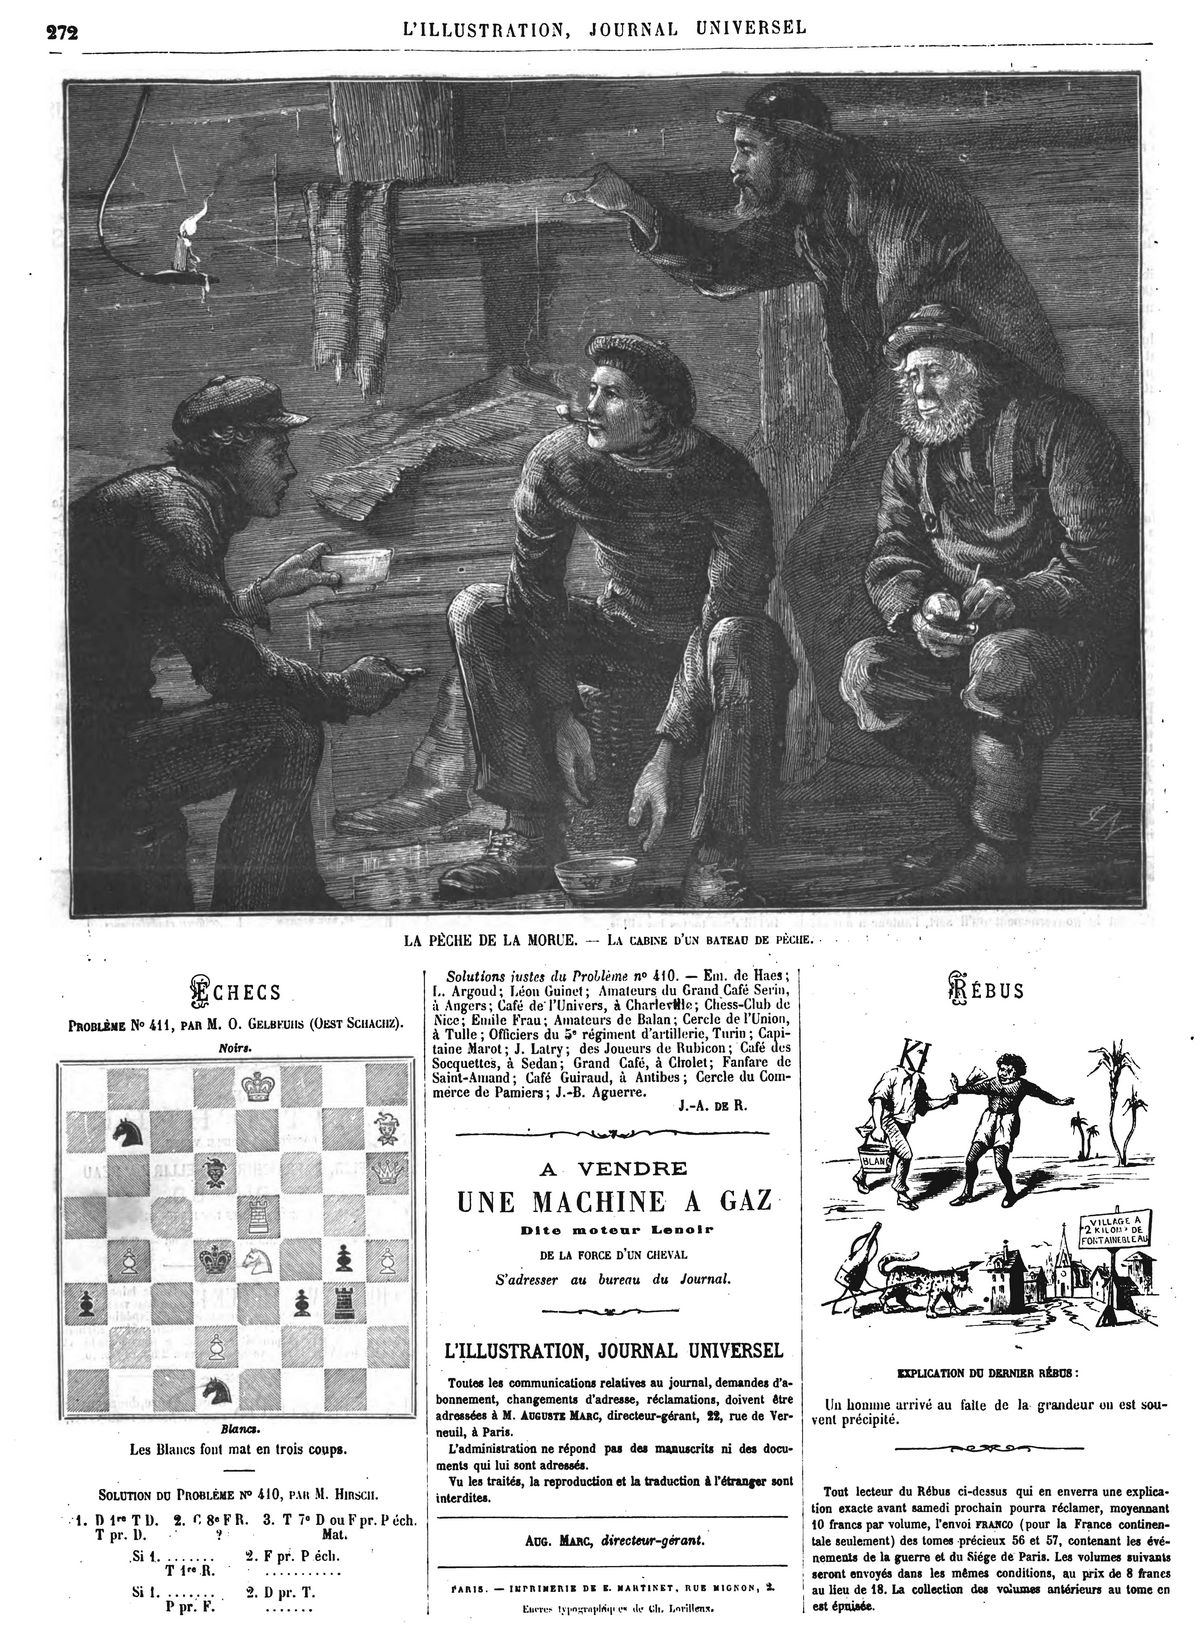 La pêche de la morue : la cabine d'un bateau de pêche. (gravure 1874)